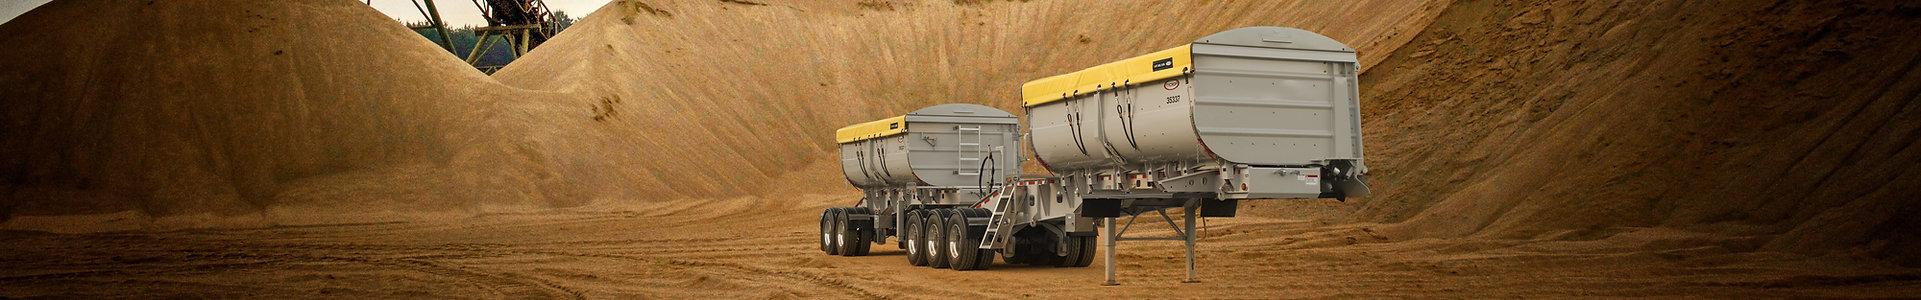 TYCROP ConveyOre Mining Trailer